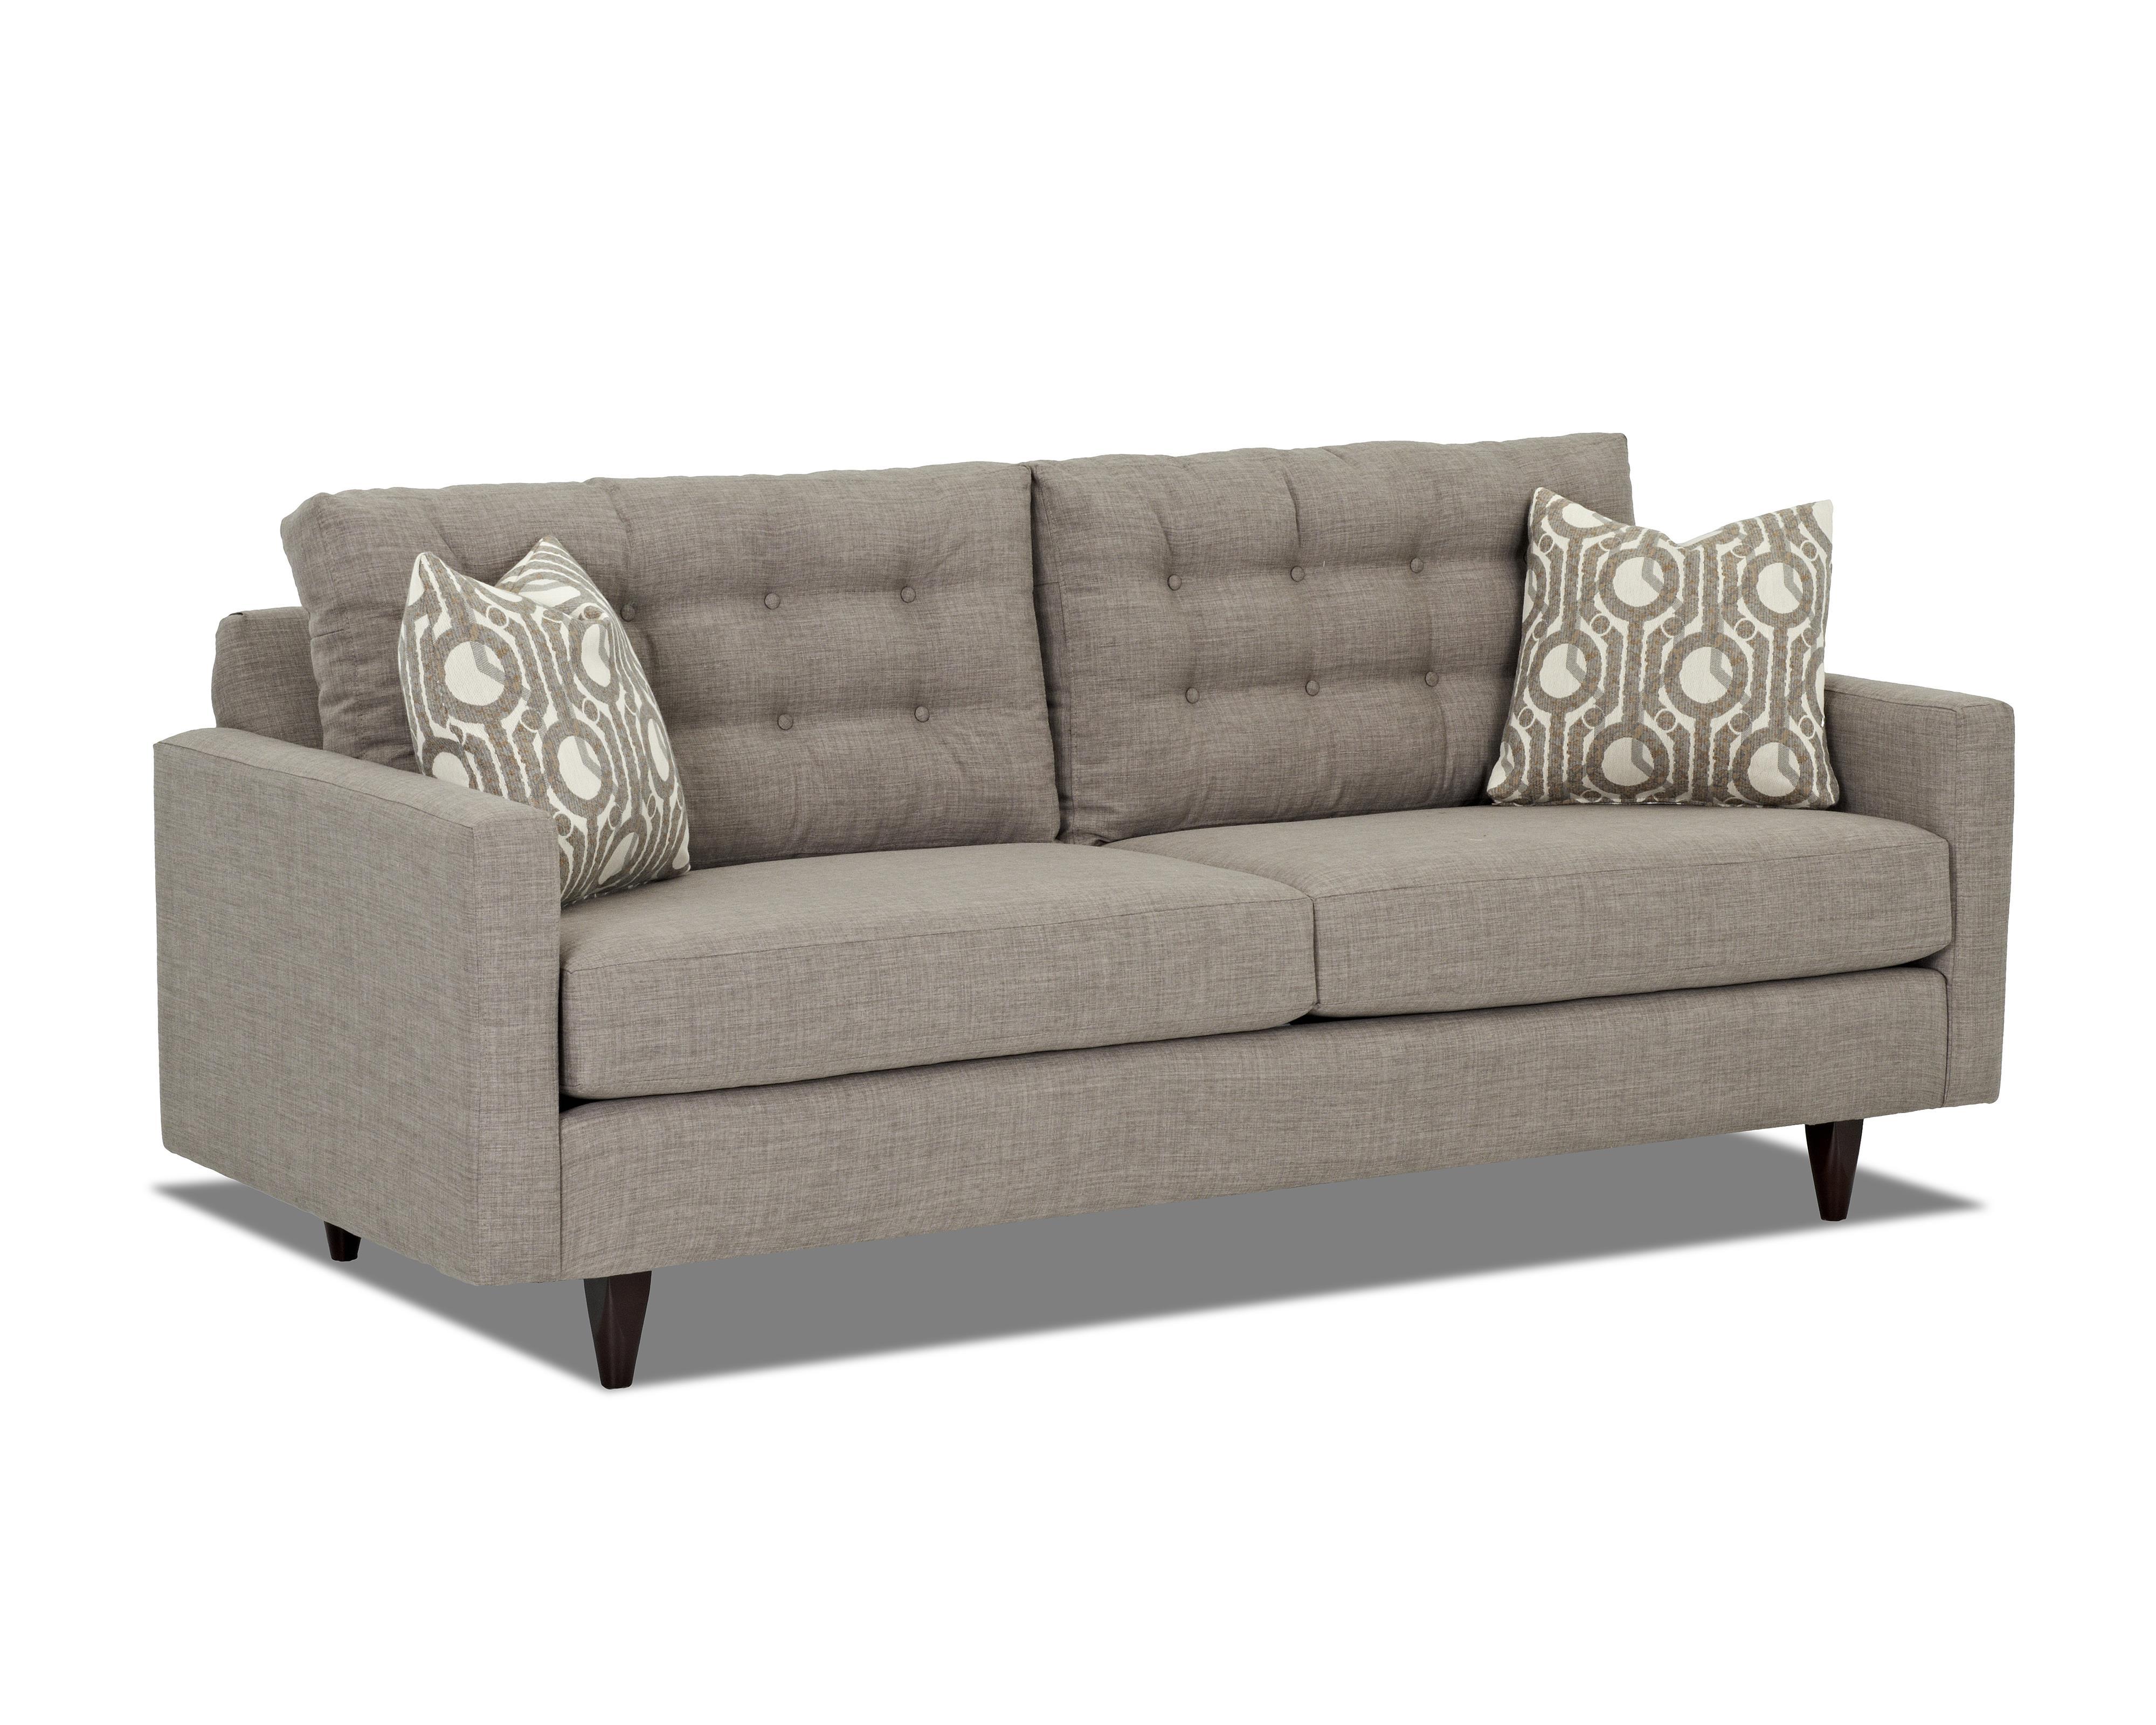 Klaussner Craven  Sofa - Item Number: K30520 S-FandangoStone